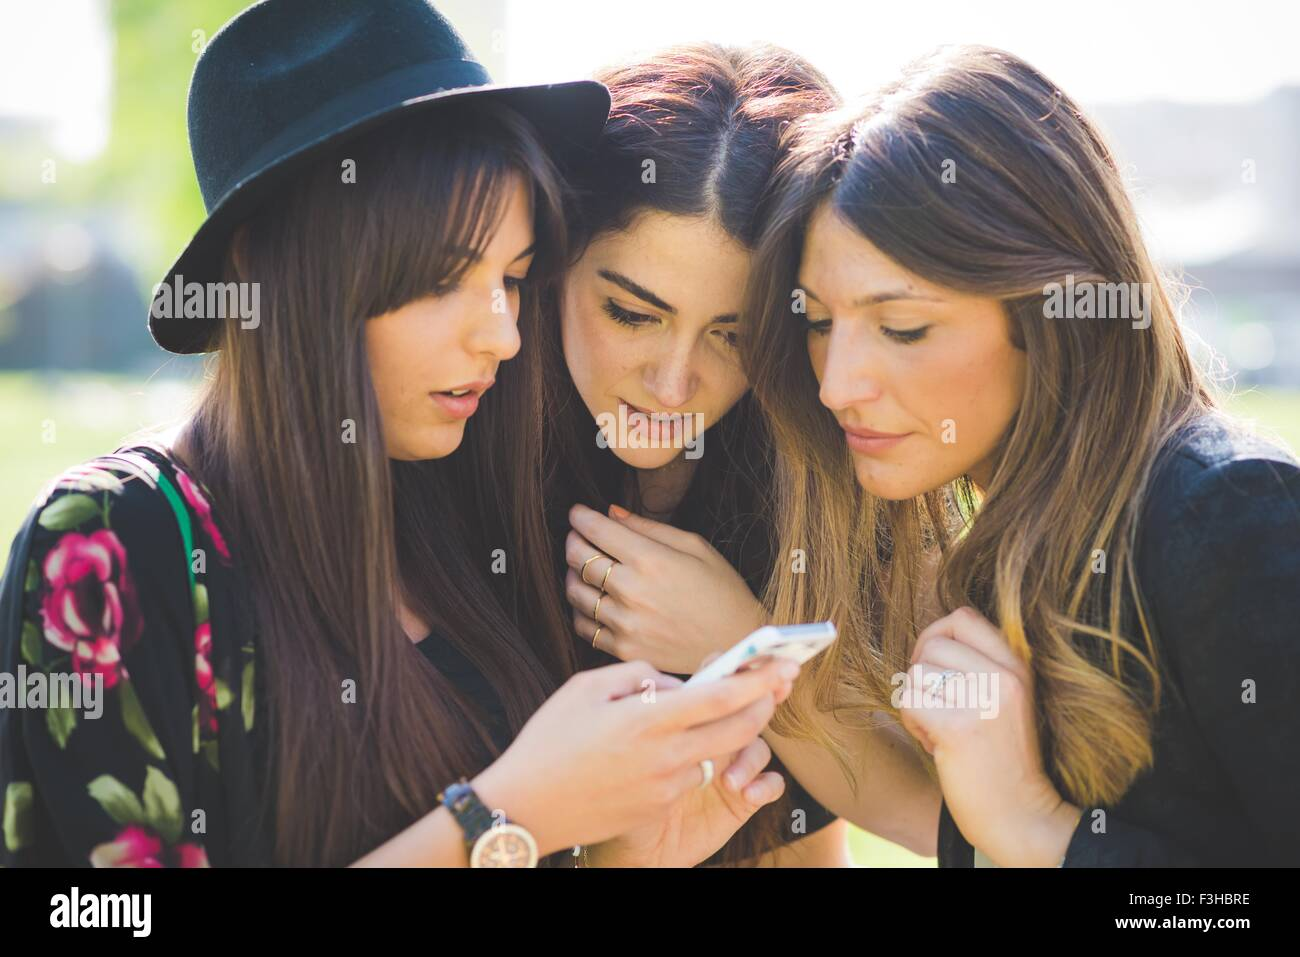 Tres jóvenes amigas huddling compartir mensajes de texto smartphone Imagen De Stock